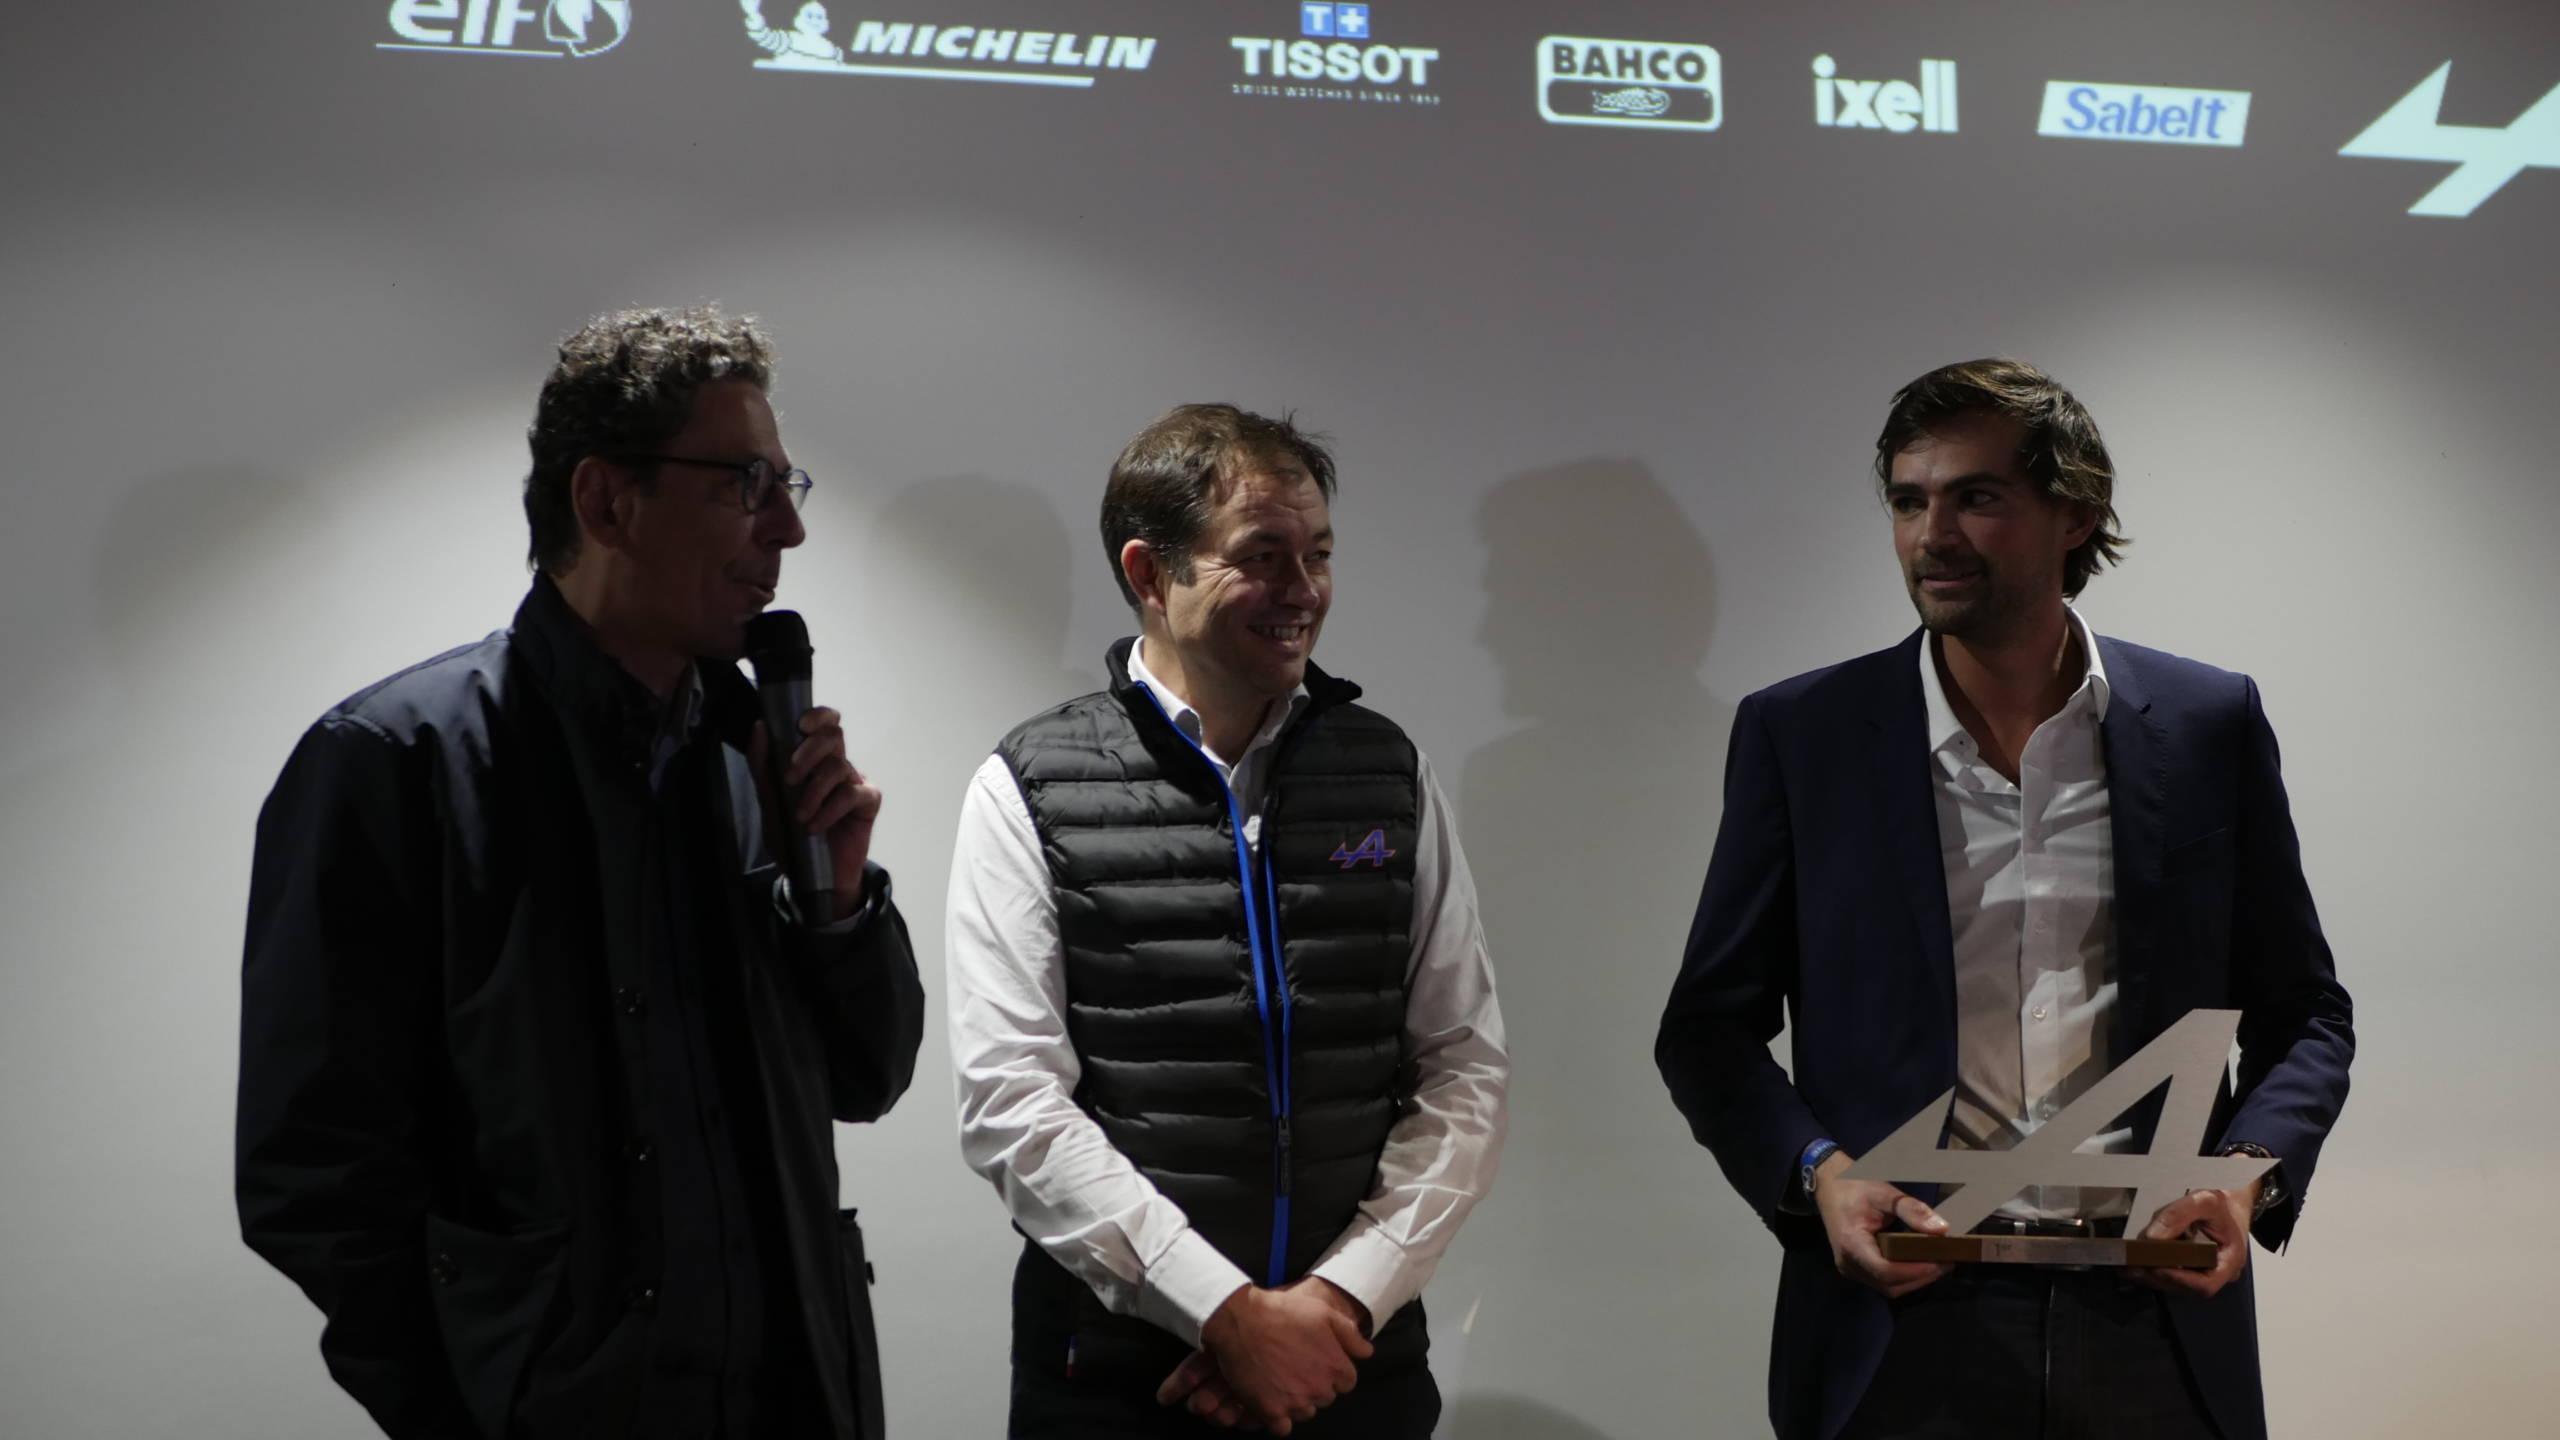 Soirée Alpine Elf Europa Cup 2018 récompense Showroom CMR 9 | Alpine Elf Europa Cup: par ici le programme 2019 !